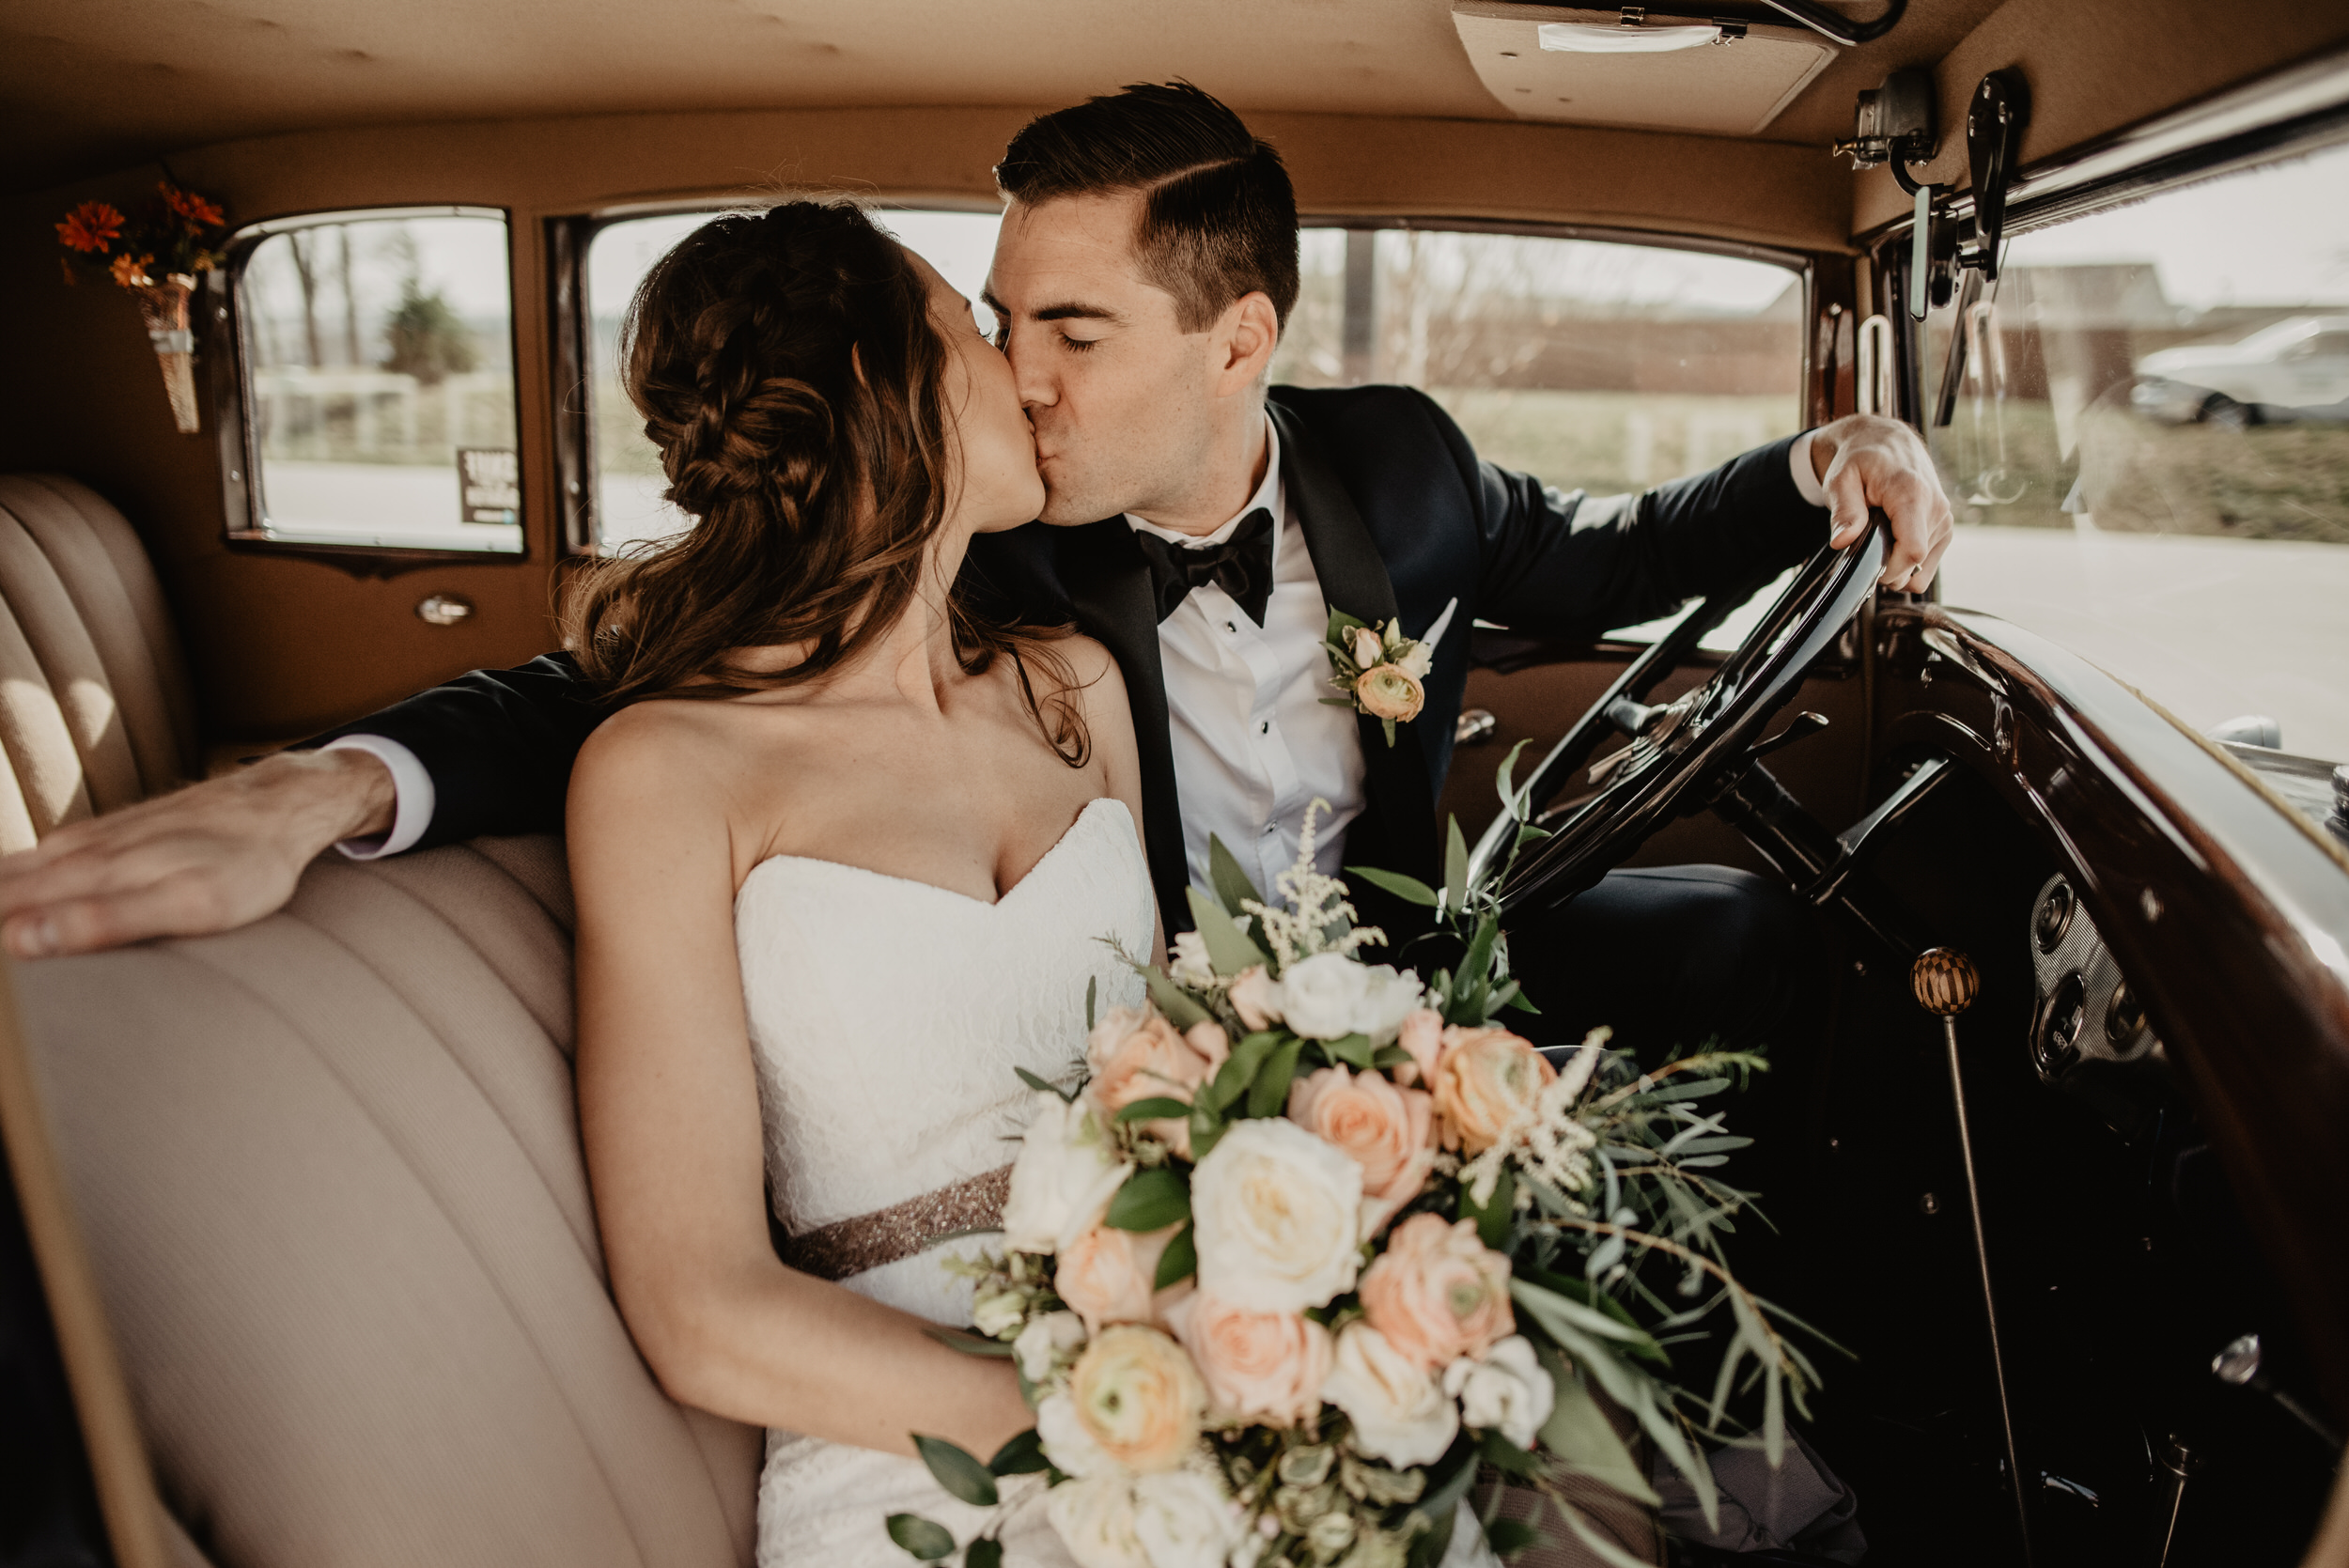 The+Barn+at+the+Ackerhurst+Dairy+Farm+Omaha+Nebraska+Wedding+Kaylie+Sirek+Photography051.jpg